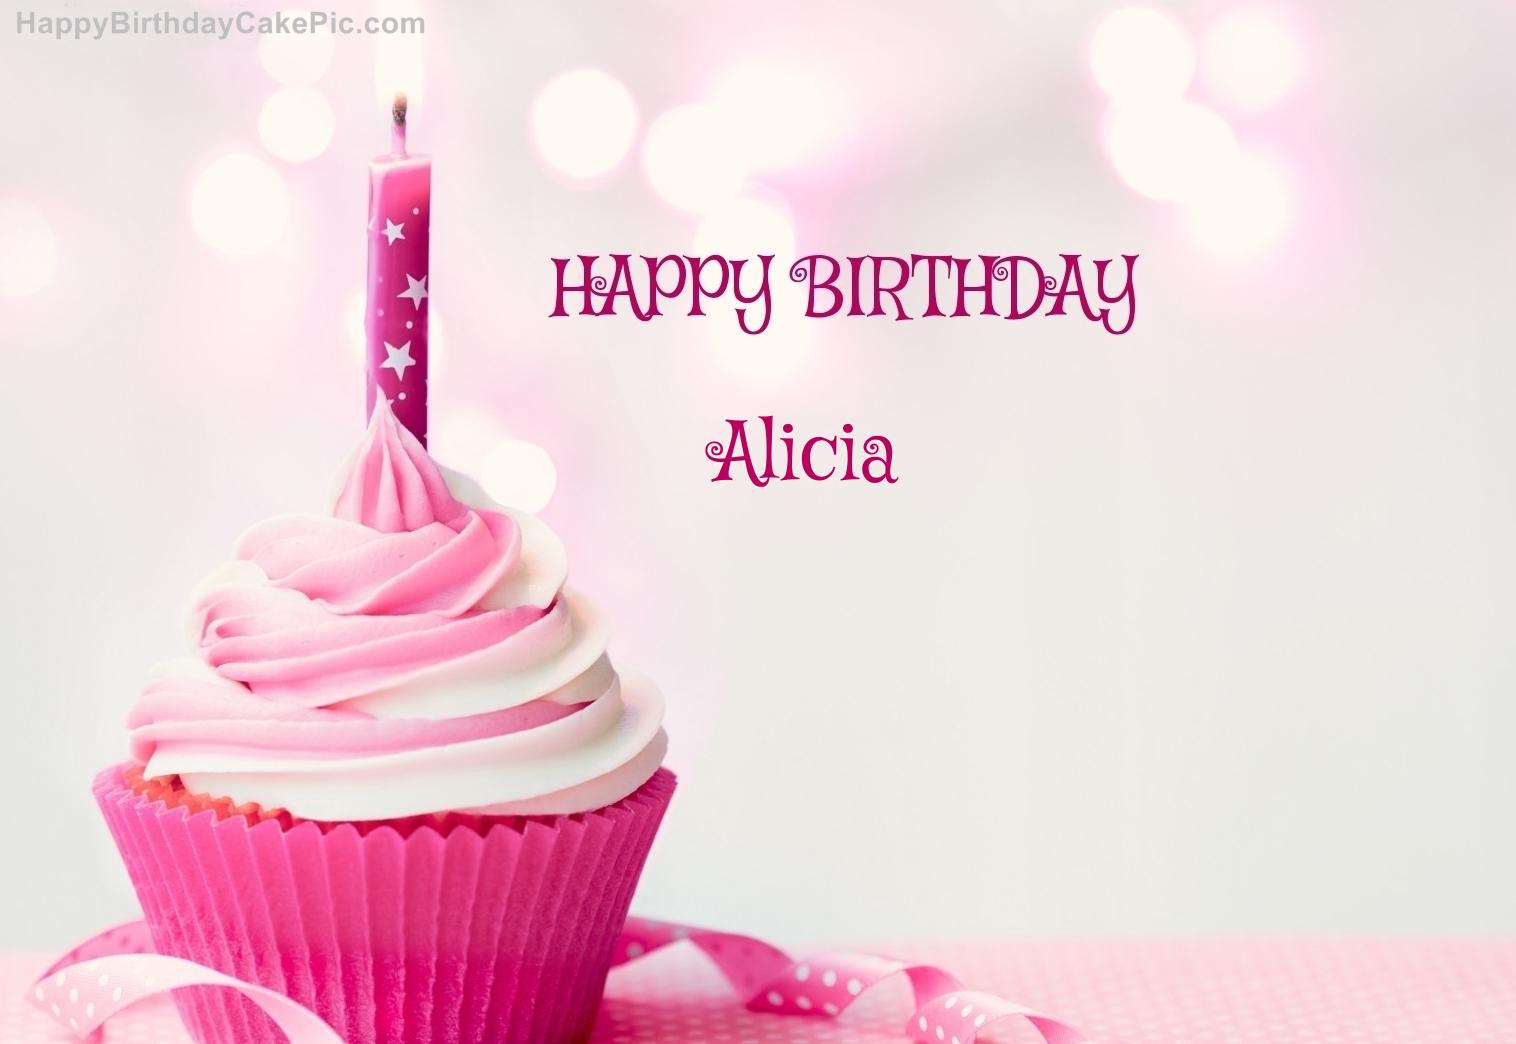 Alicia happy birthday Happy Birthday